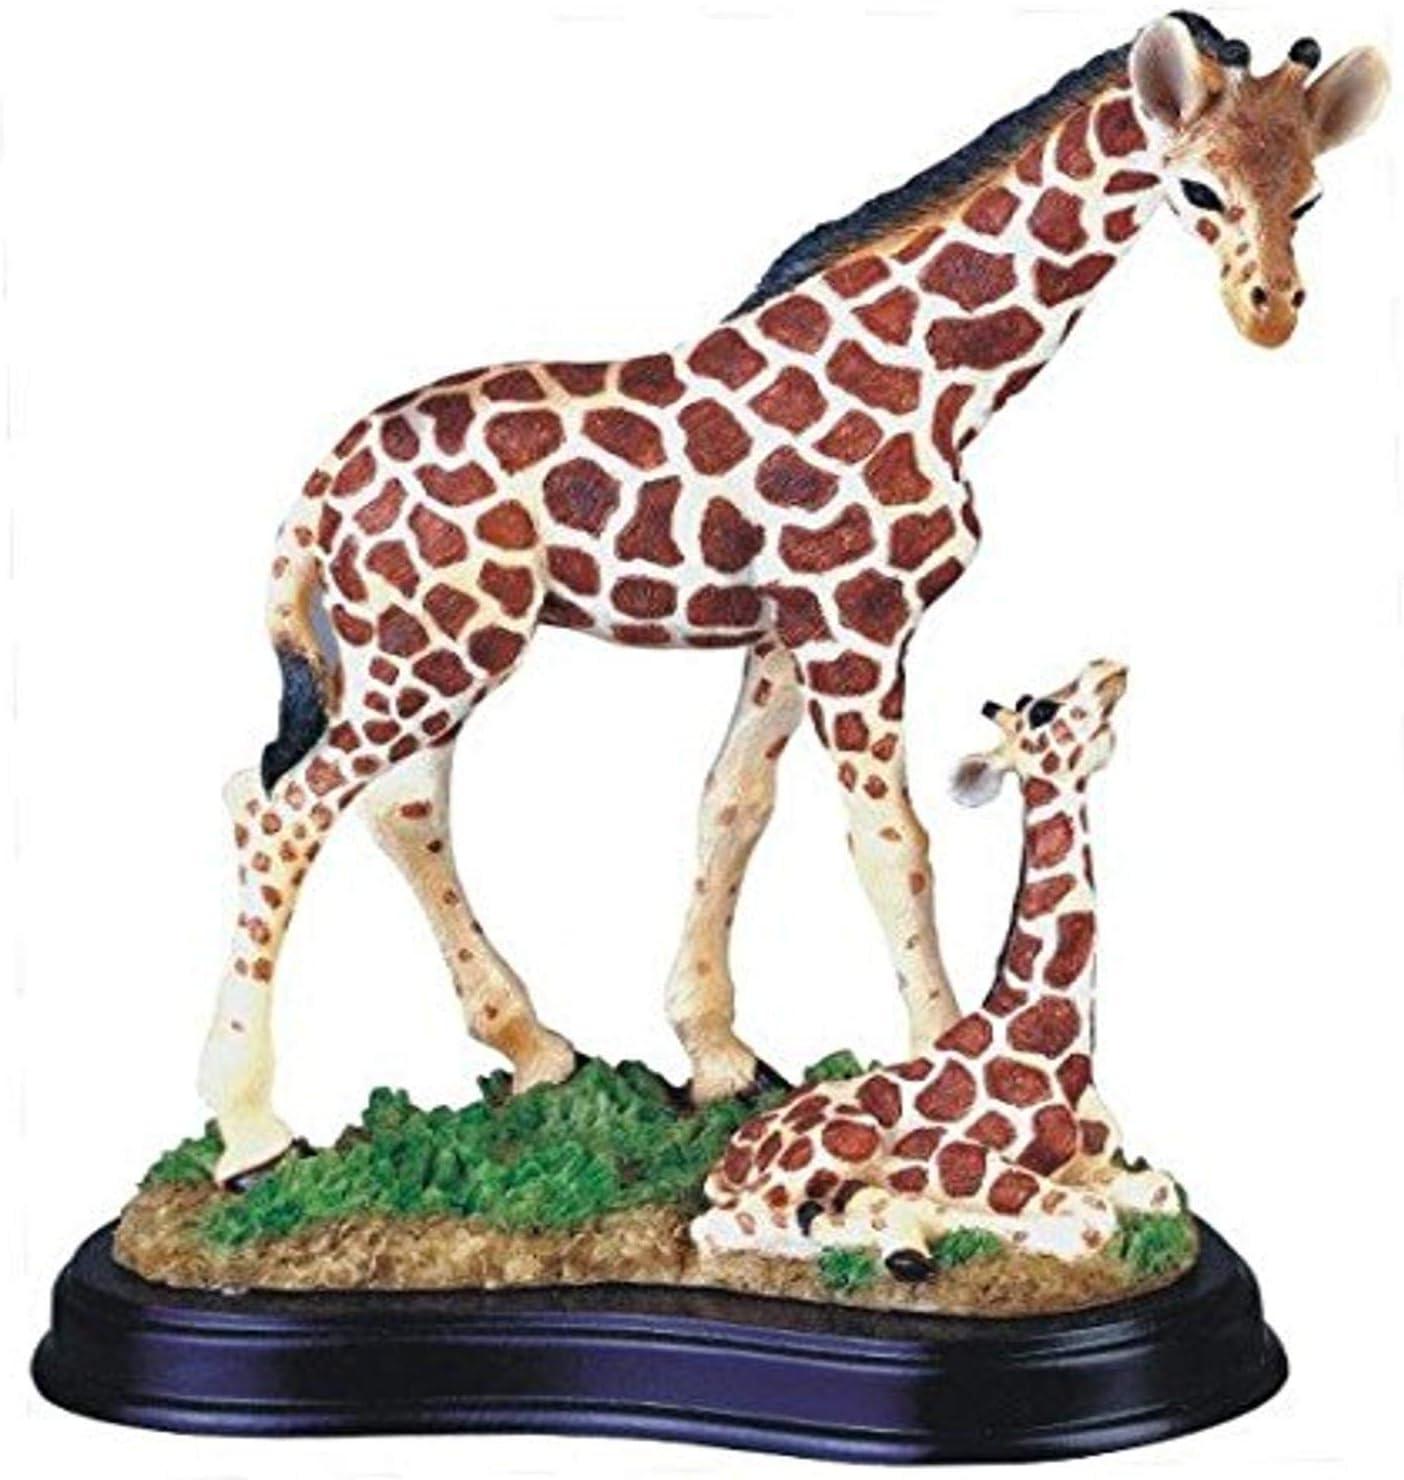 StealStreet SS-G-54004 Giraffe with Baby Collectible Wildlife Figurine Sculpture Statue Model